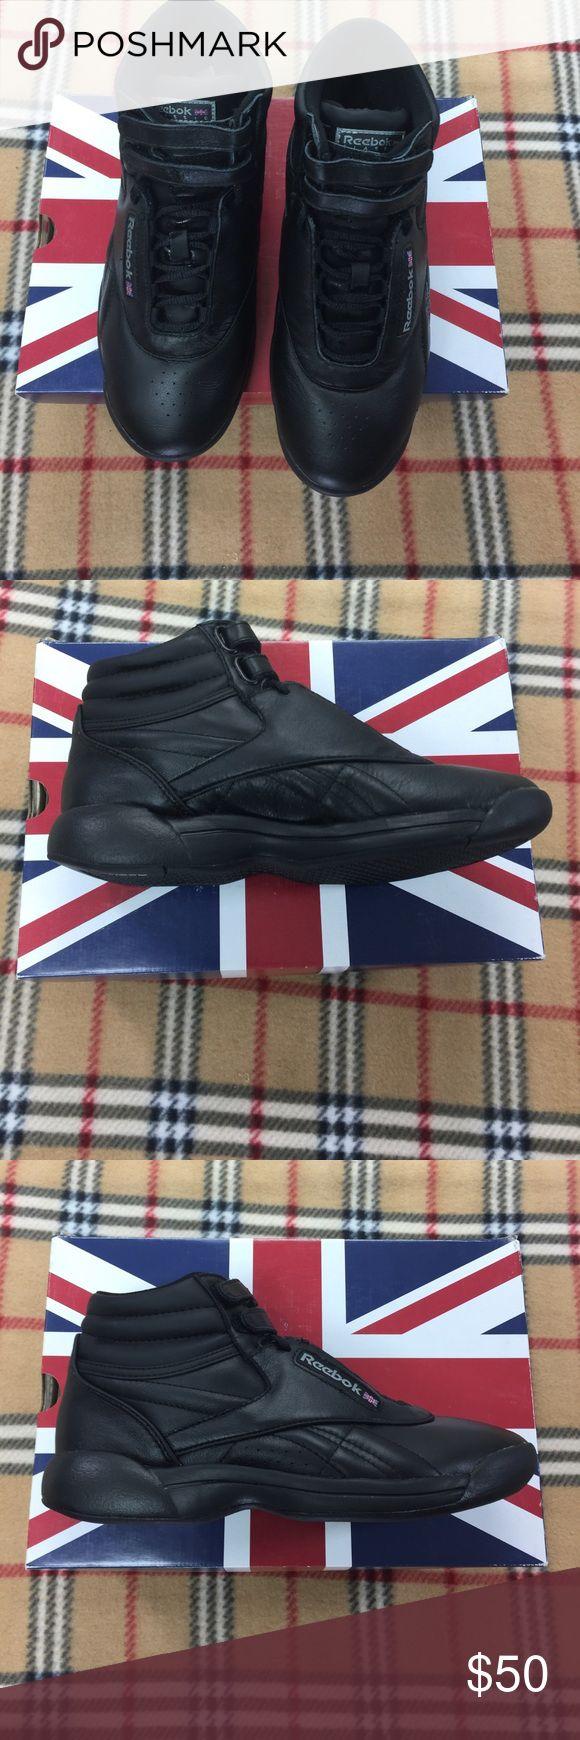 VTG/NIB Reebok Classic Freedom MID Brand new in box shoes Reebok Shoes Sneakers